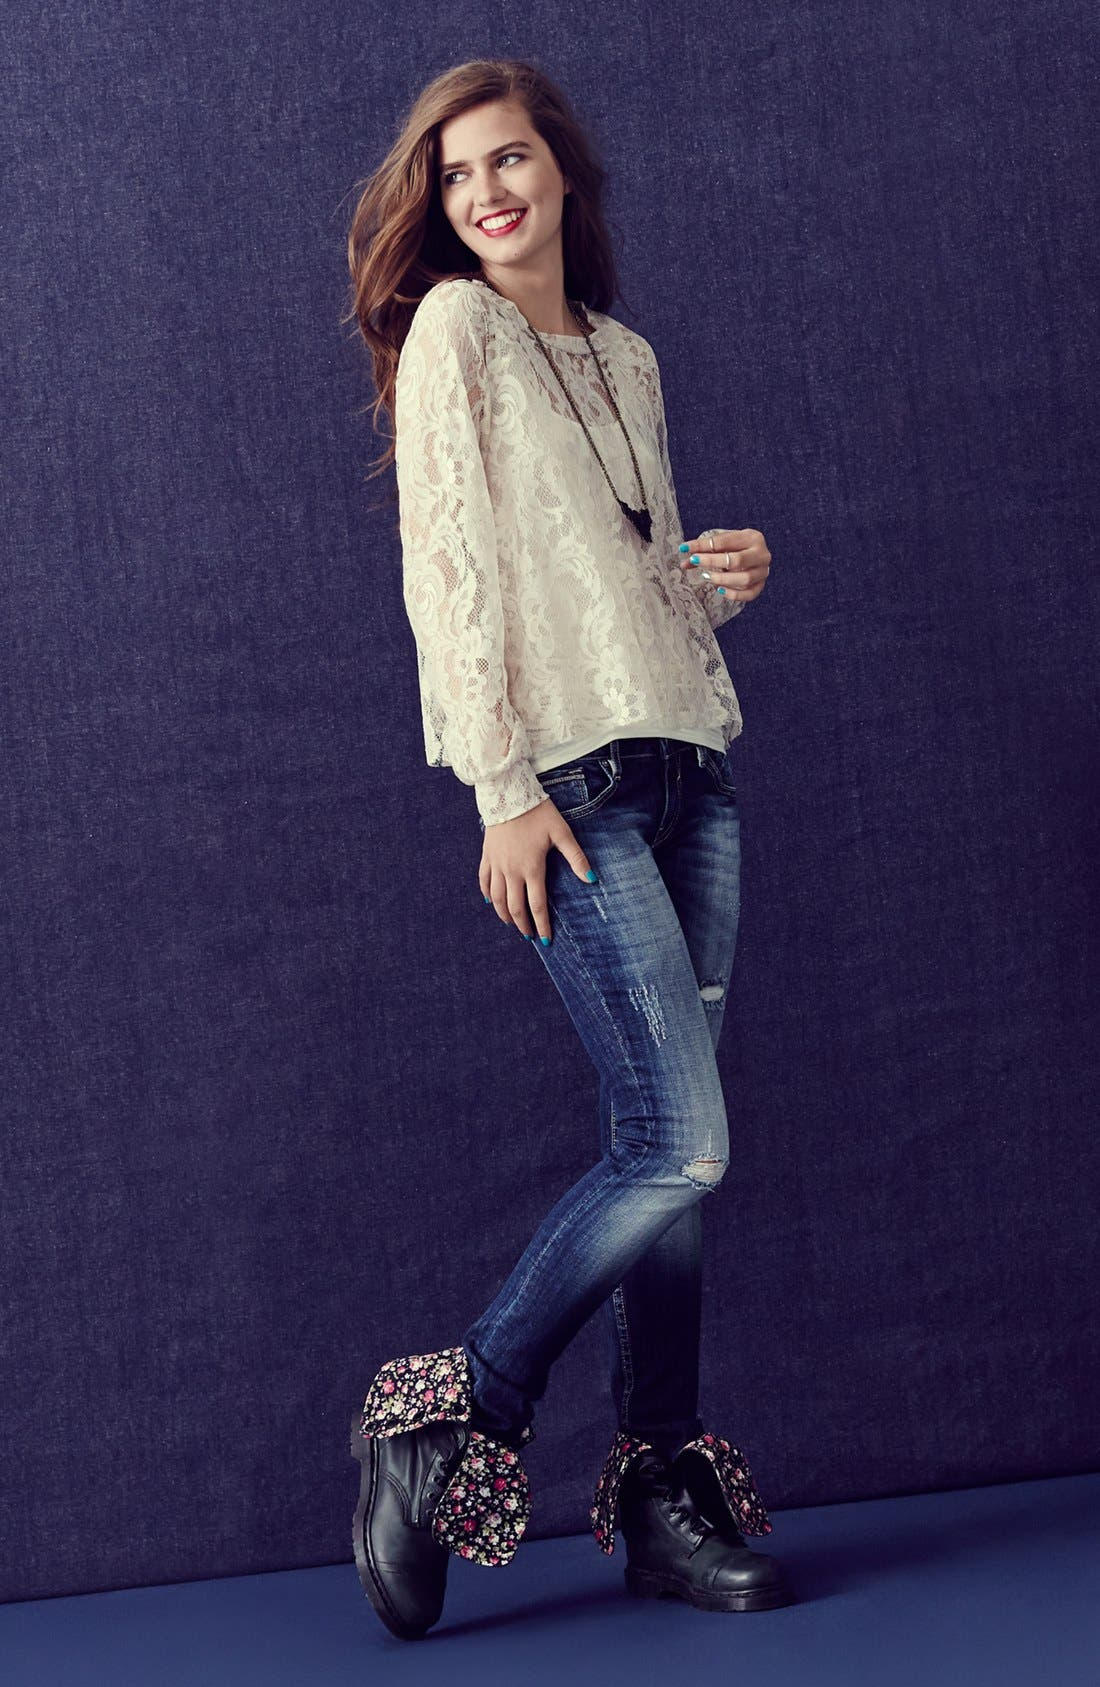 Alternate Image 1 Selected - Lily White Top & Vigoss Skinny Jeans